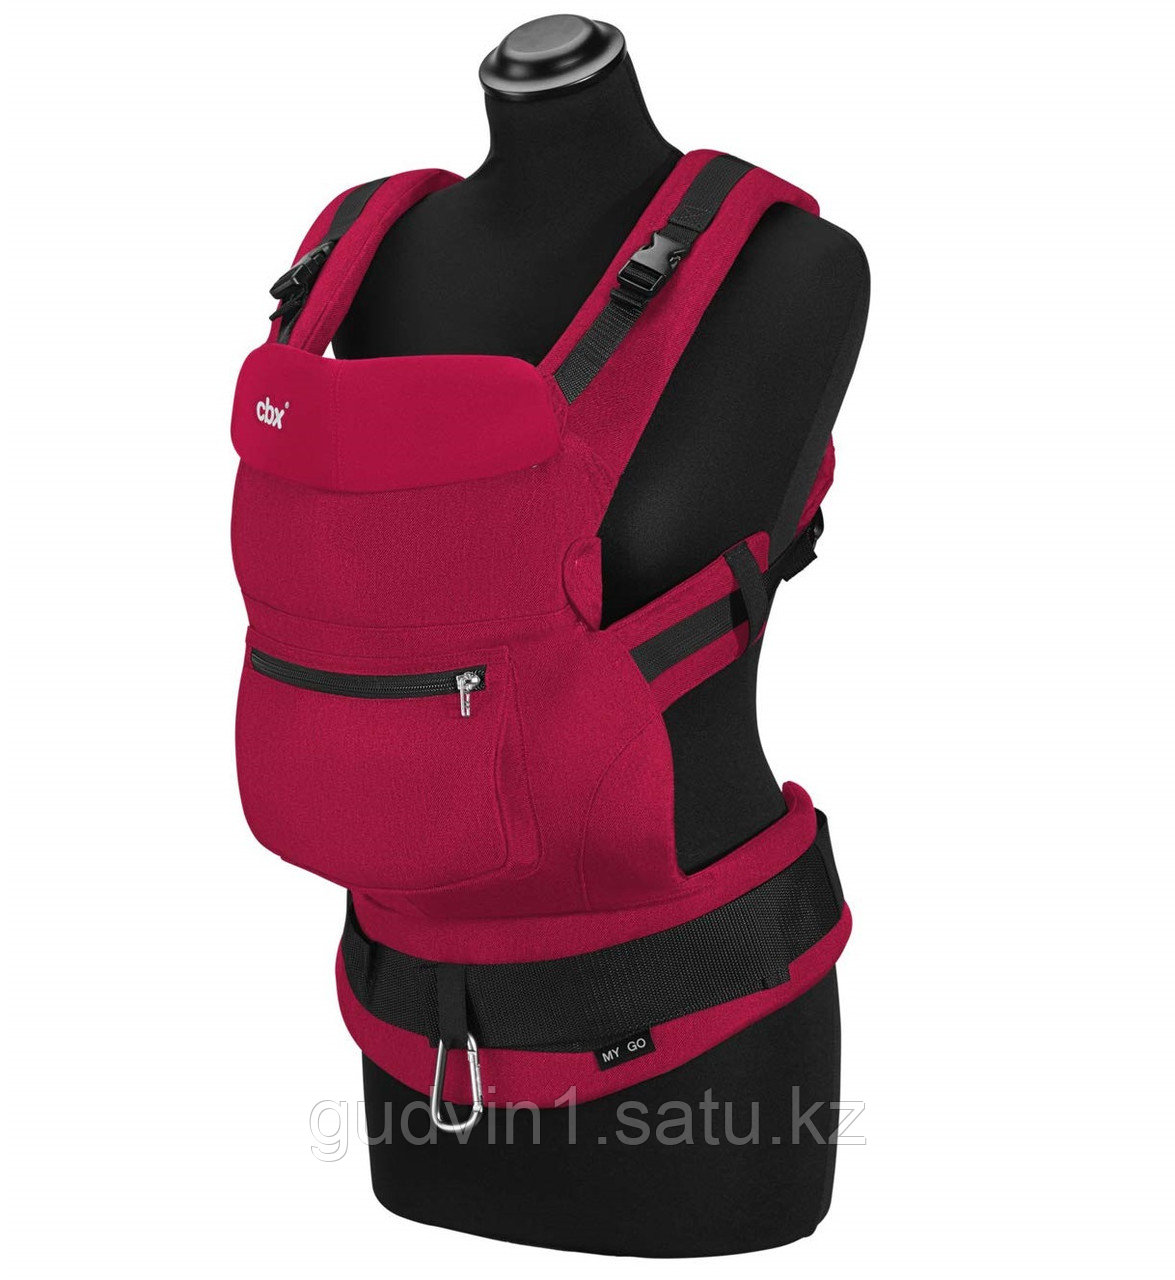 Рюкзак-переноска CBX My.Go Comfy Red 1149563